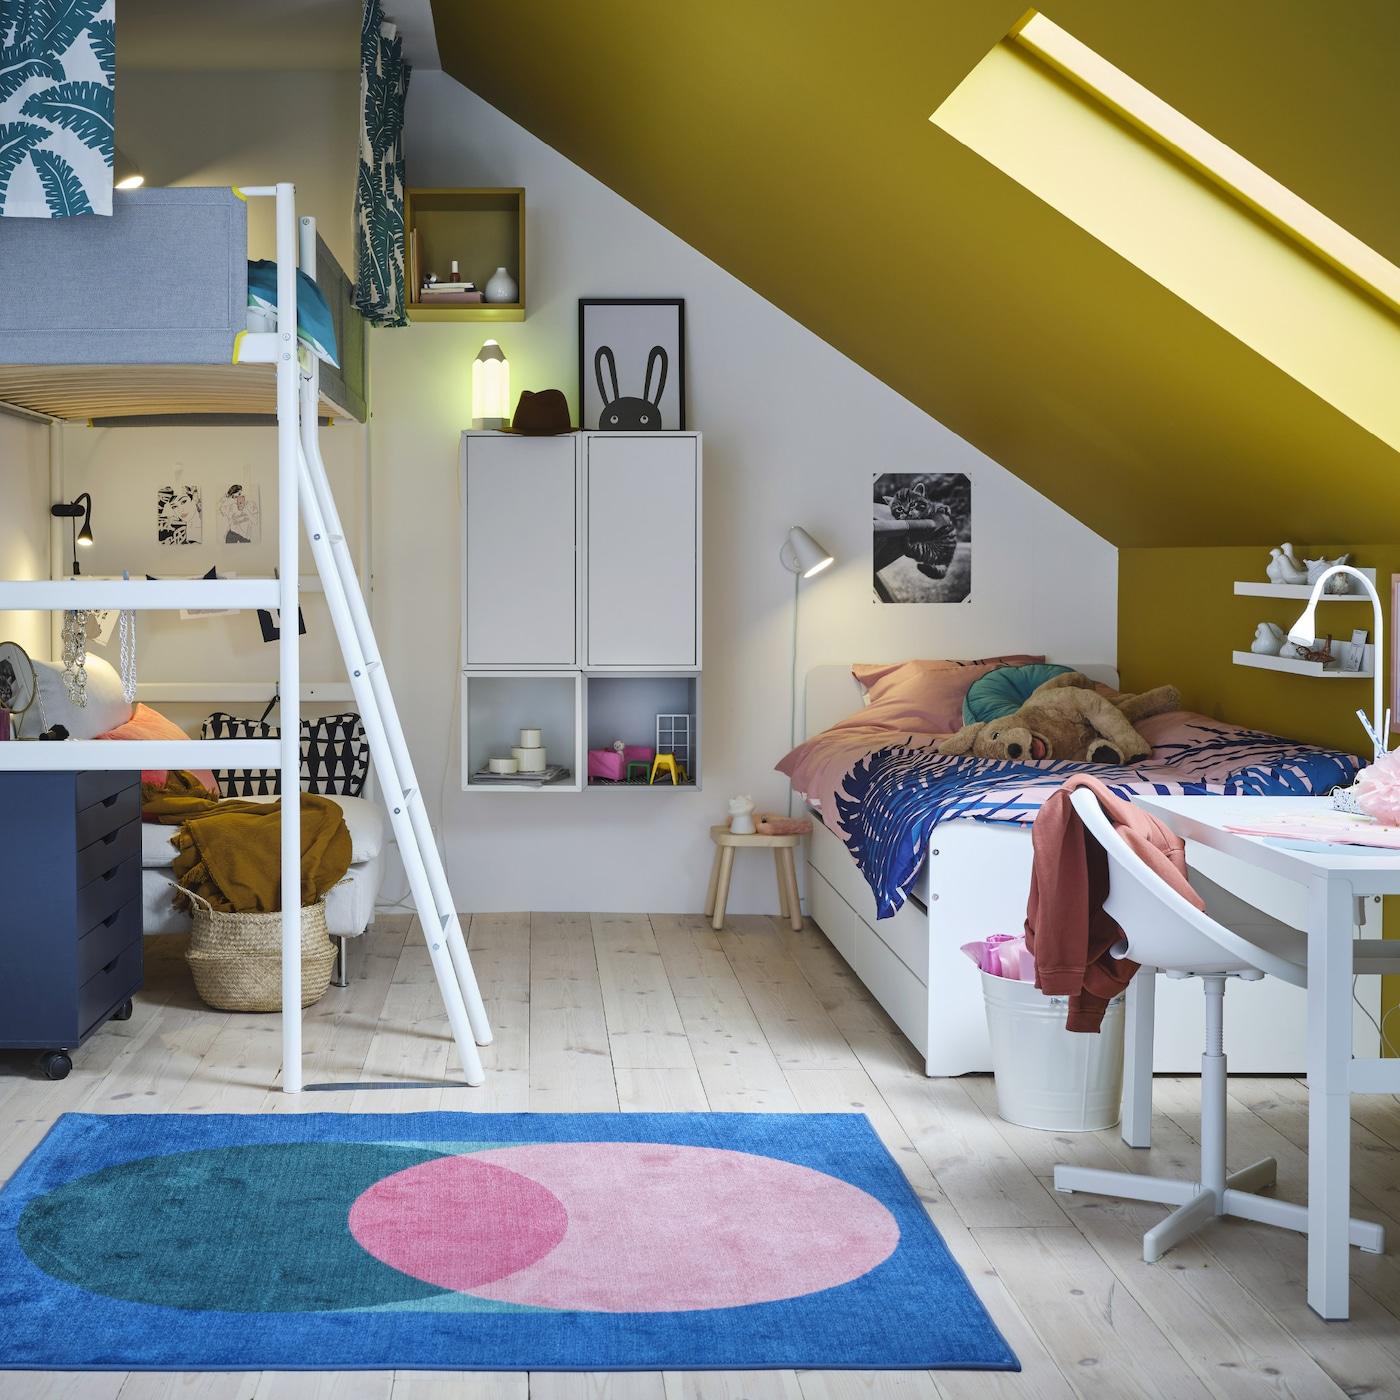 Dečja soba s izdignutim krevetom, belim krevetnim okvirom, elementima i ormarićima montiranim na zid, belim radnim stolom i roze/zelenim tepihom.